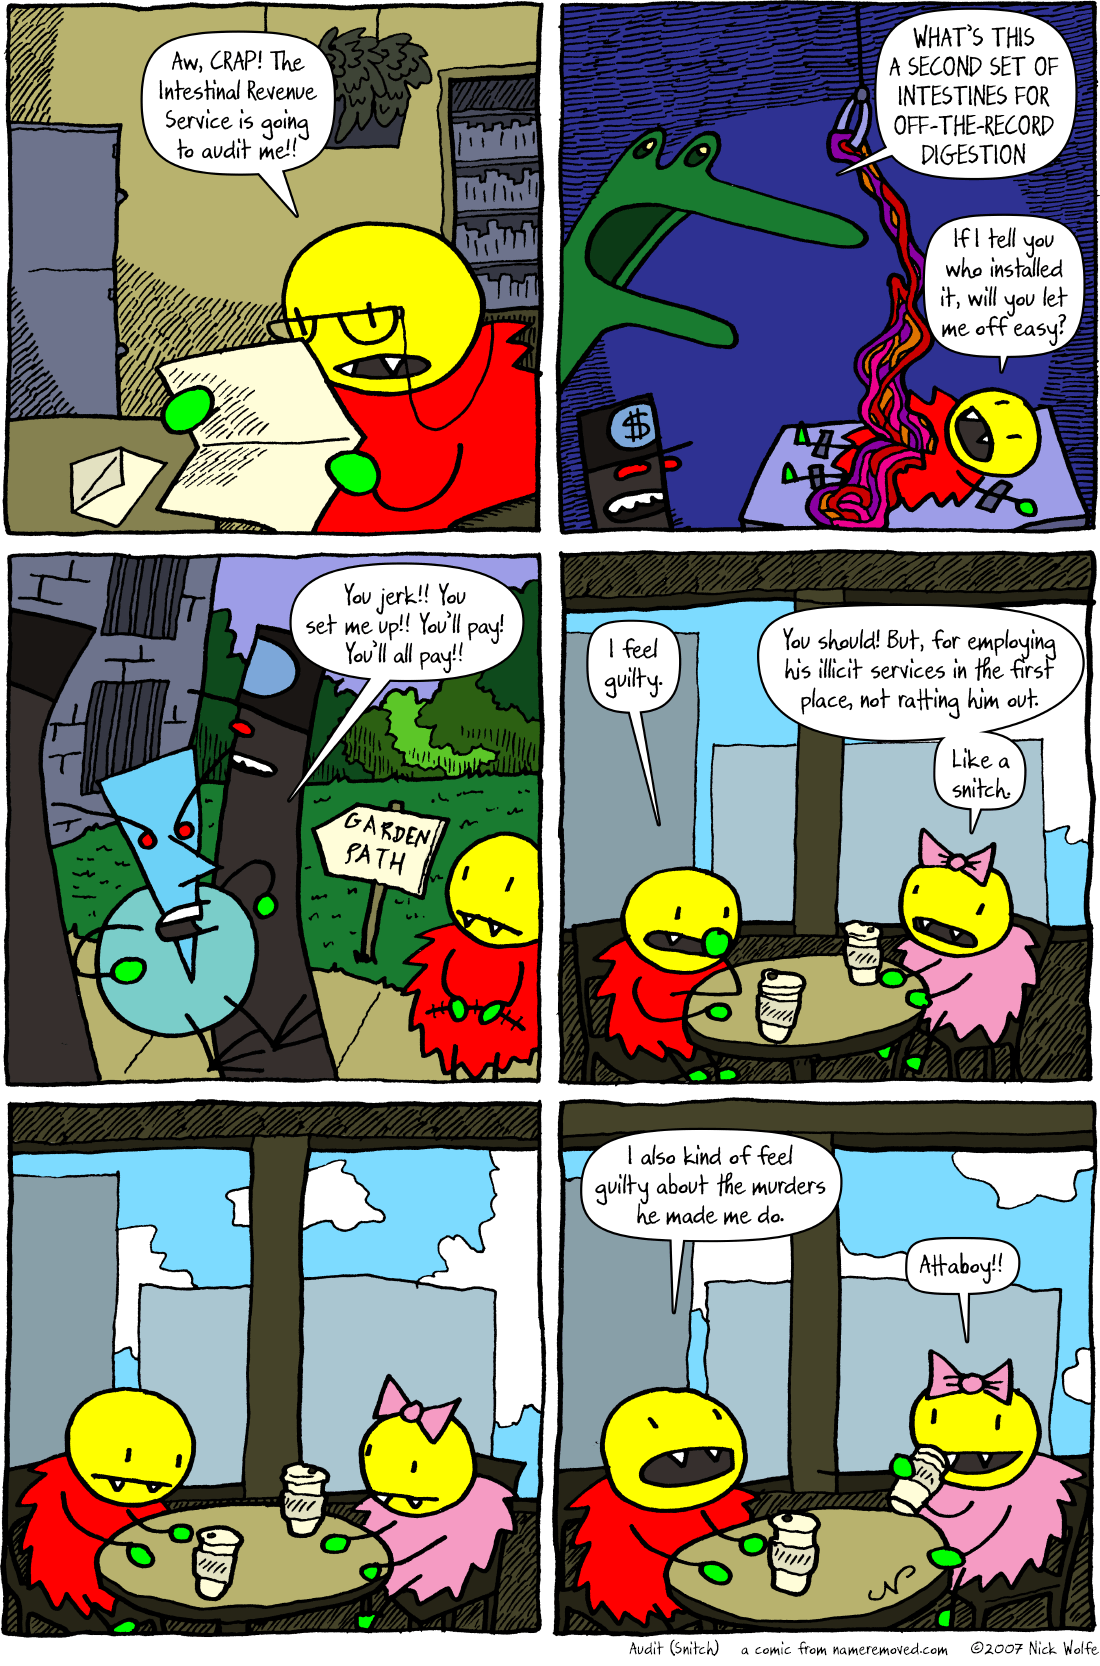 Audit (Snitch)